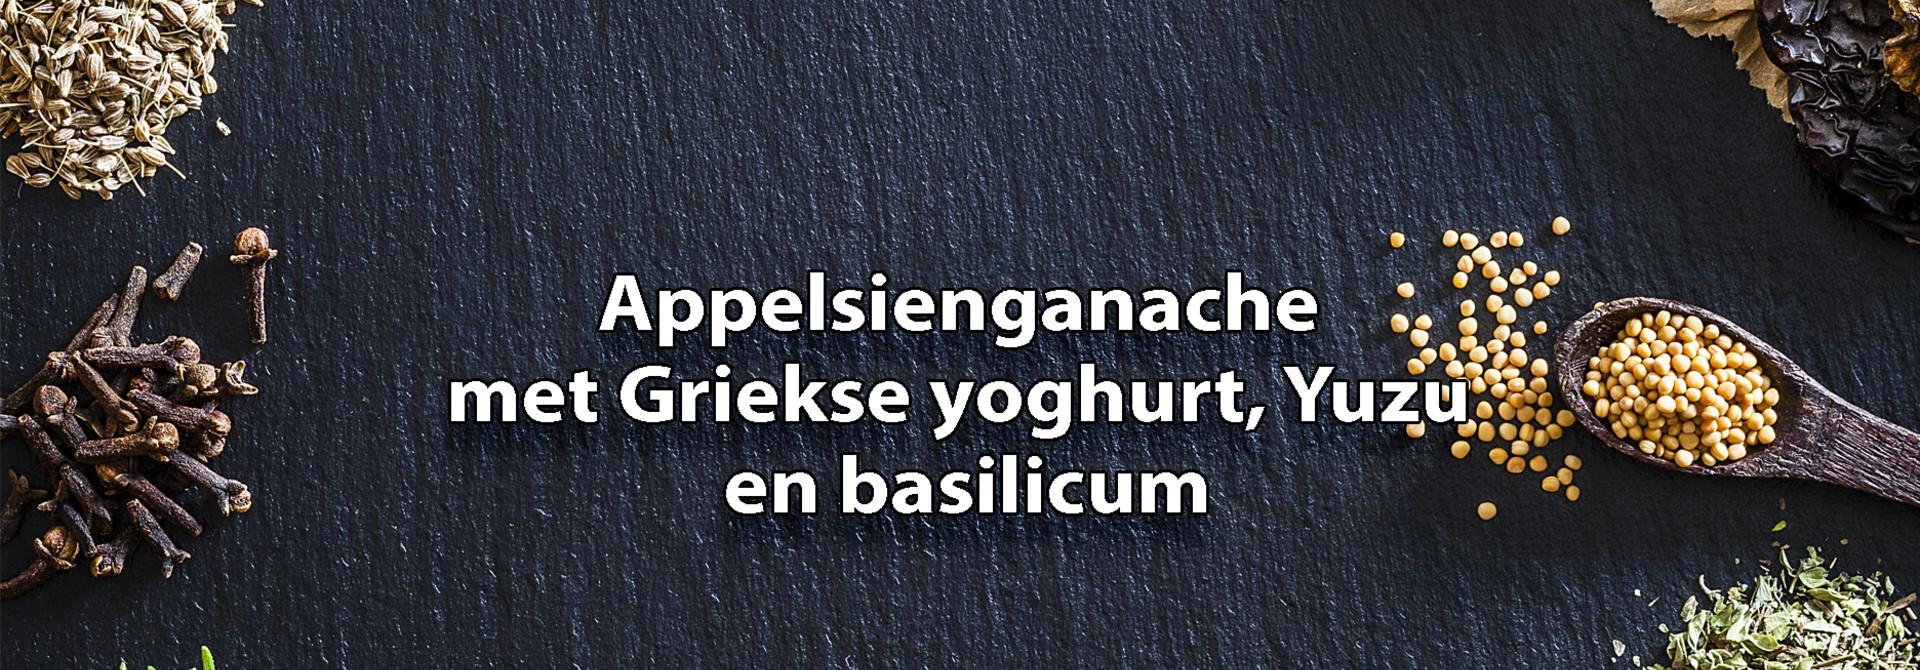 Ganache van appelsien met Griekse yoghurt en yuzu